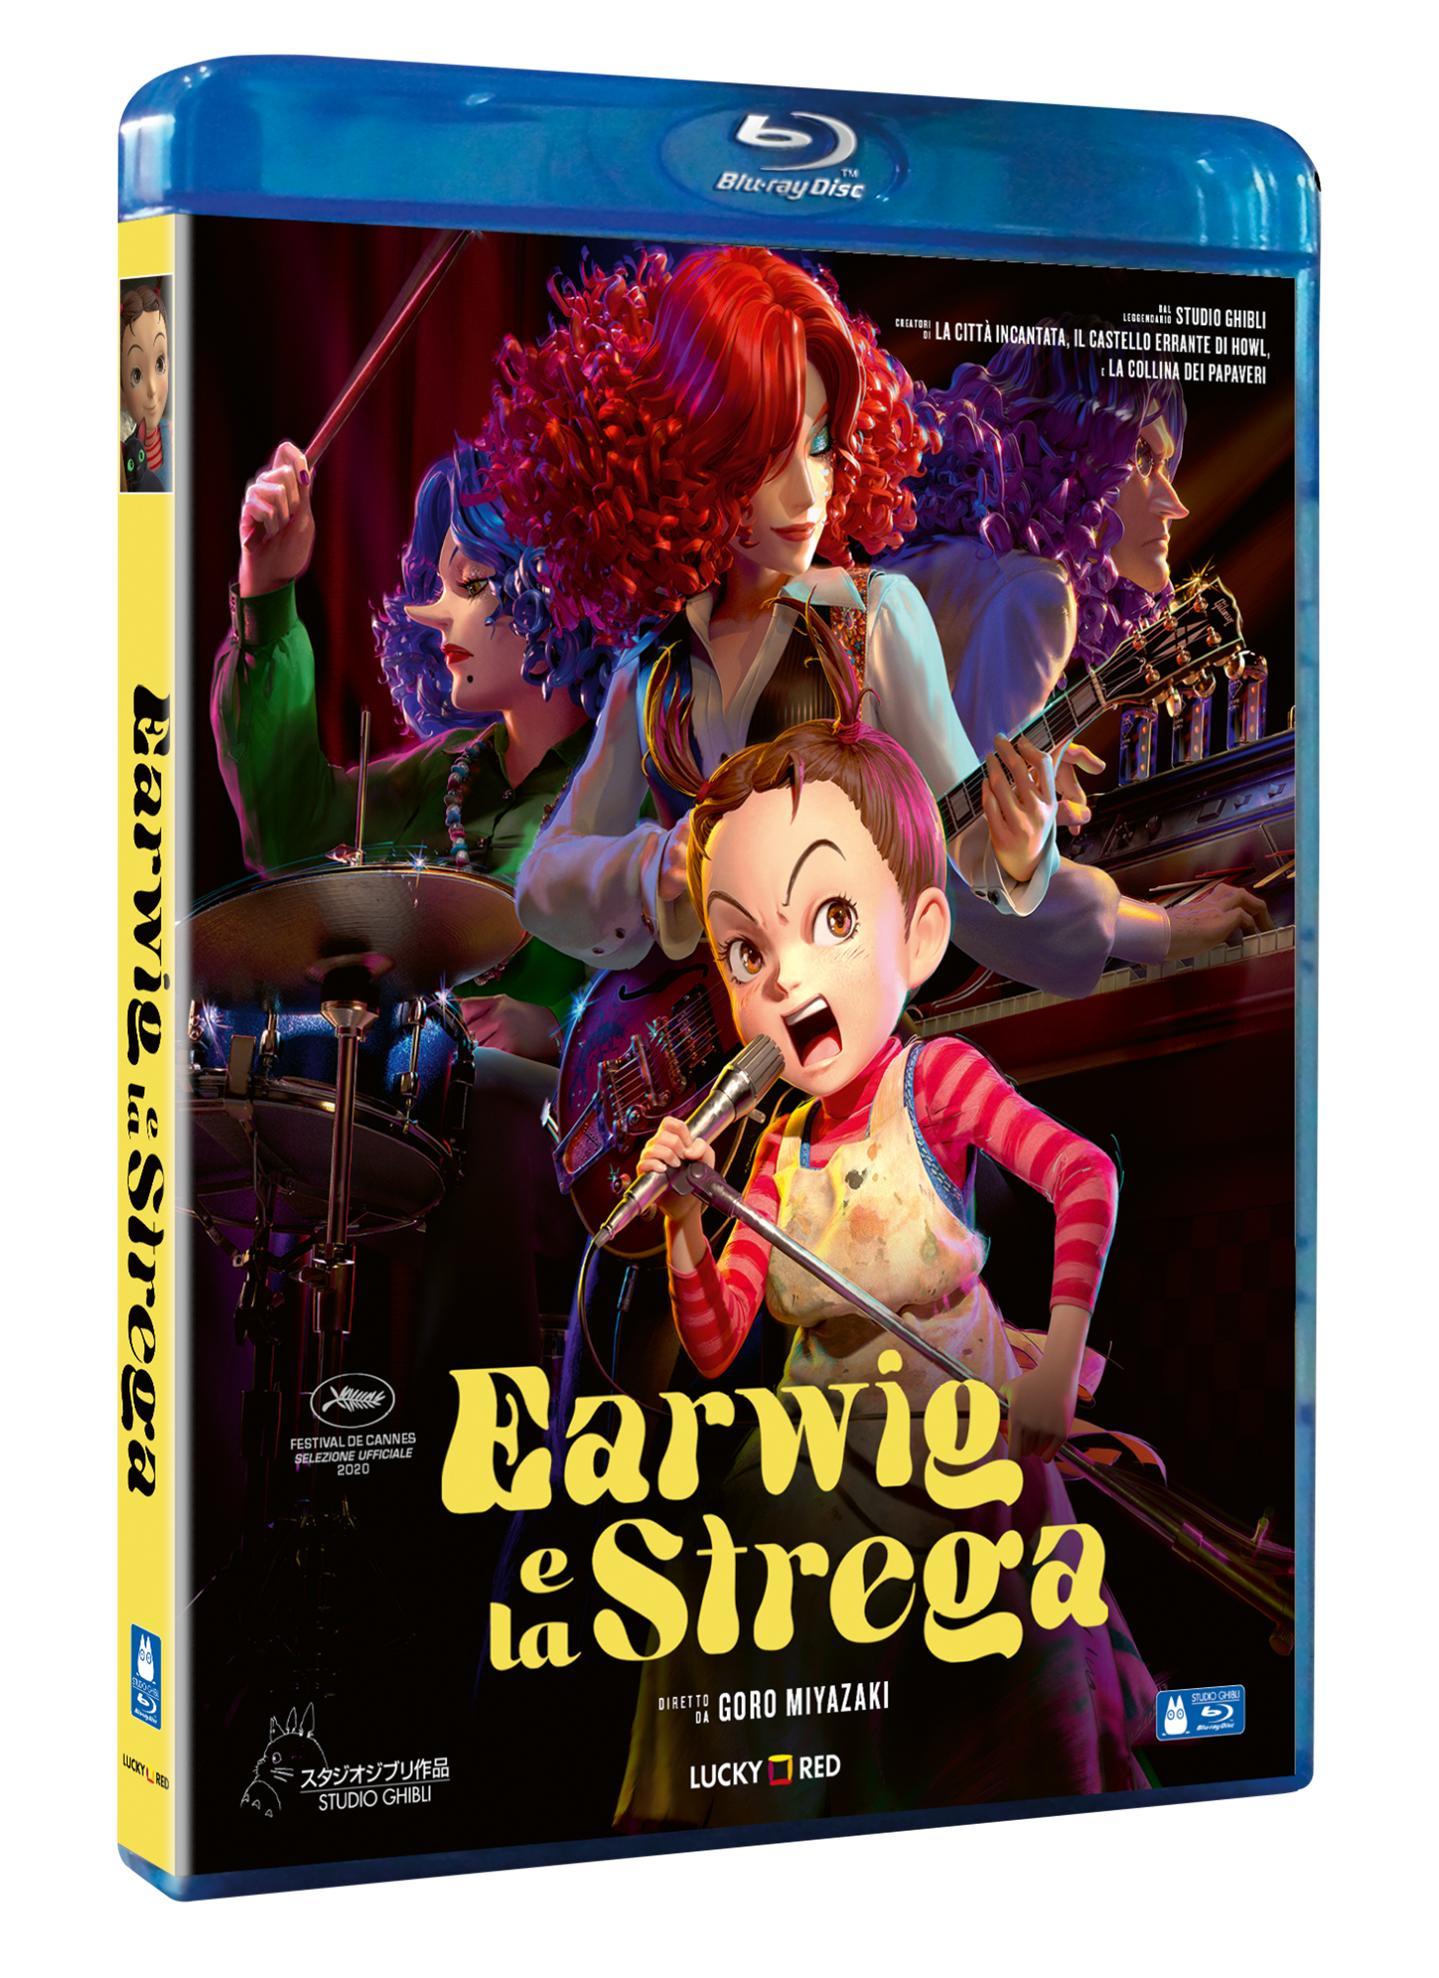 EARWIG E LA STREGA - BLU RAY